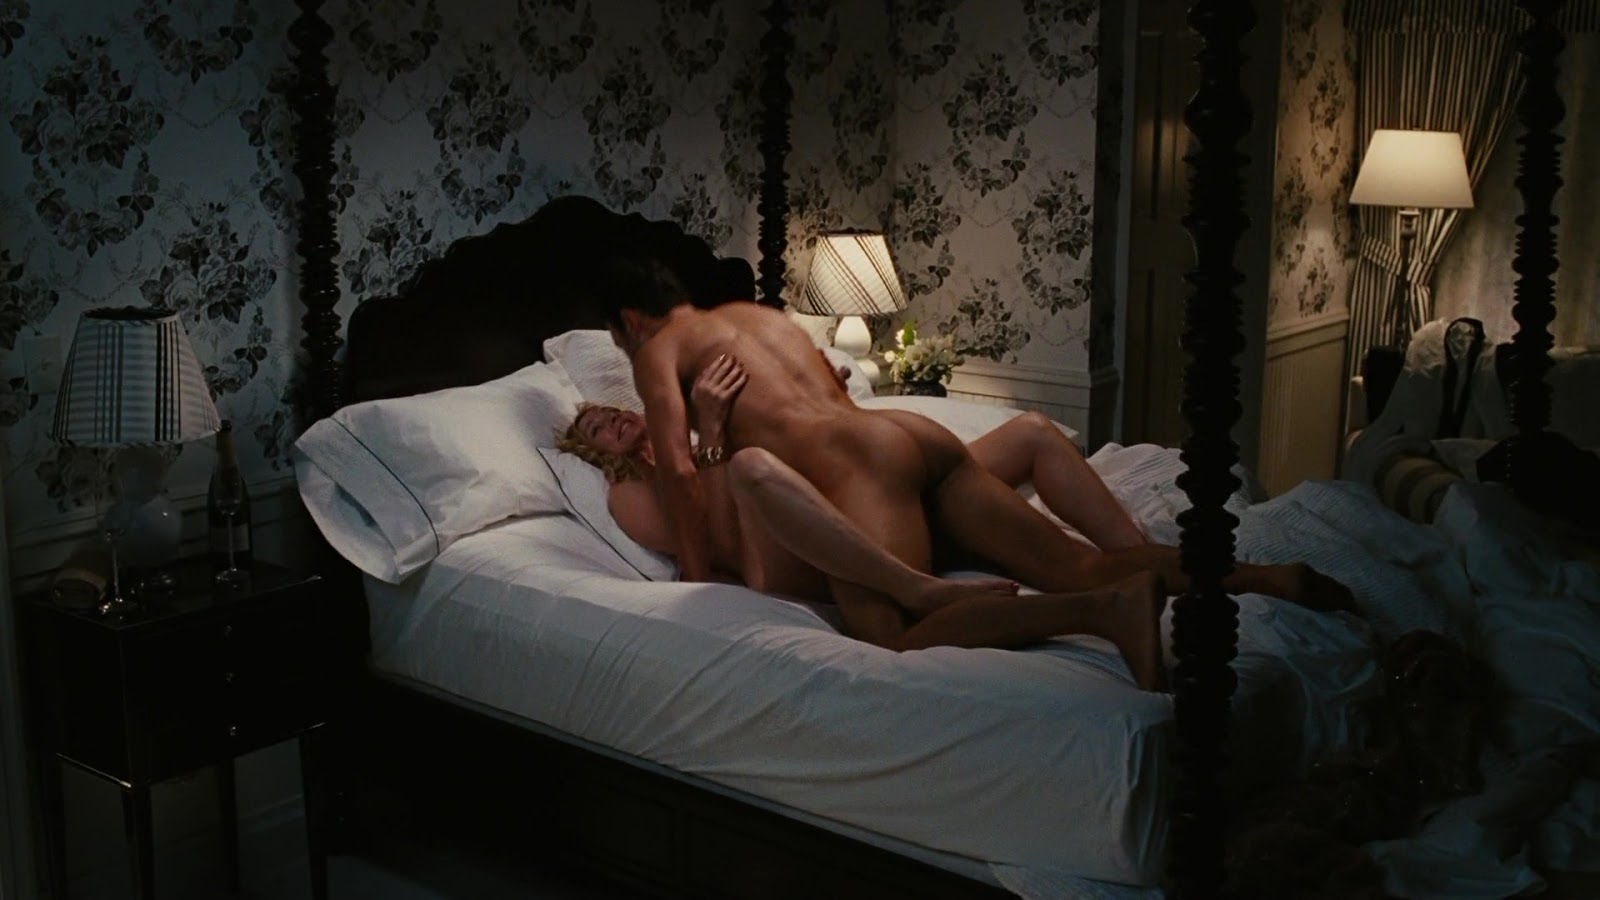 Sexy image full screen